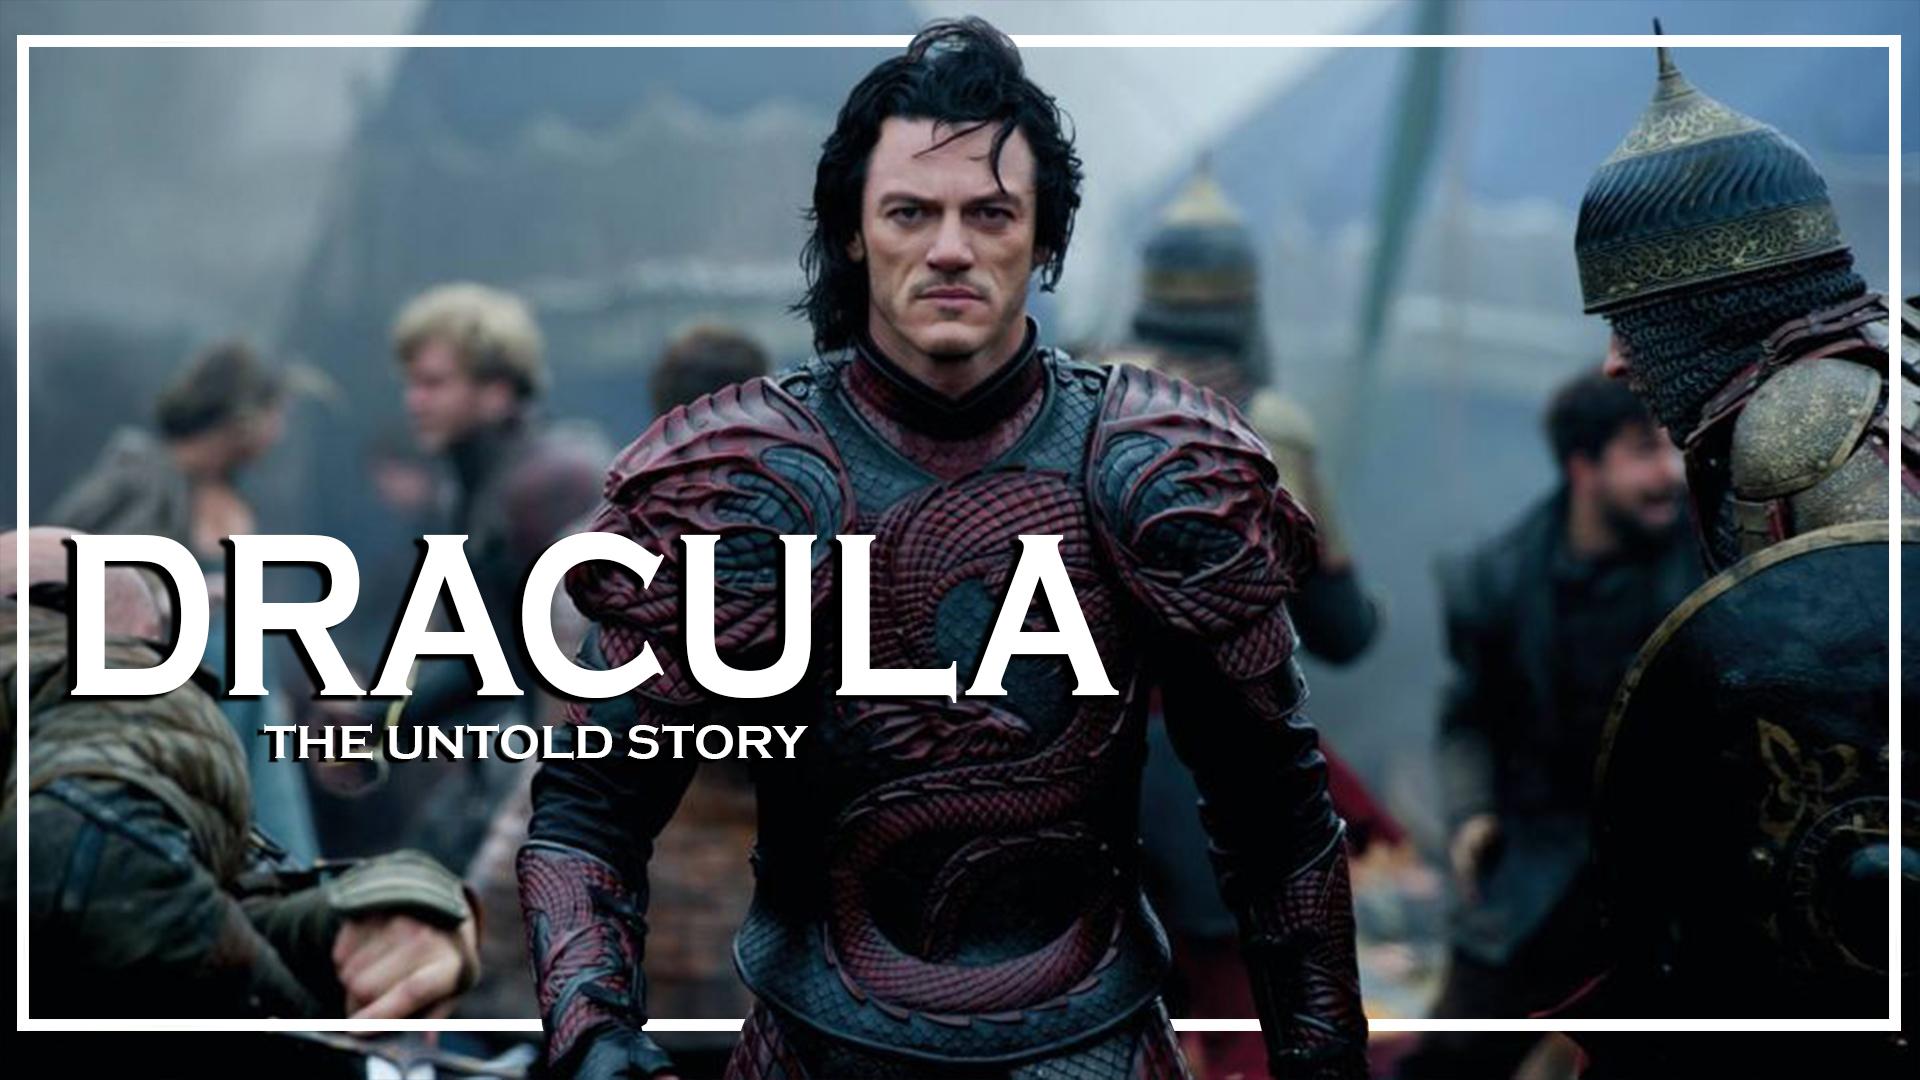 Dracula portada ingles.jpg